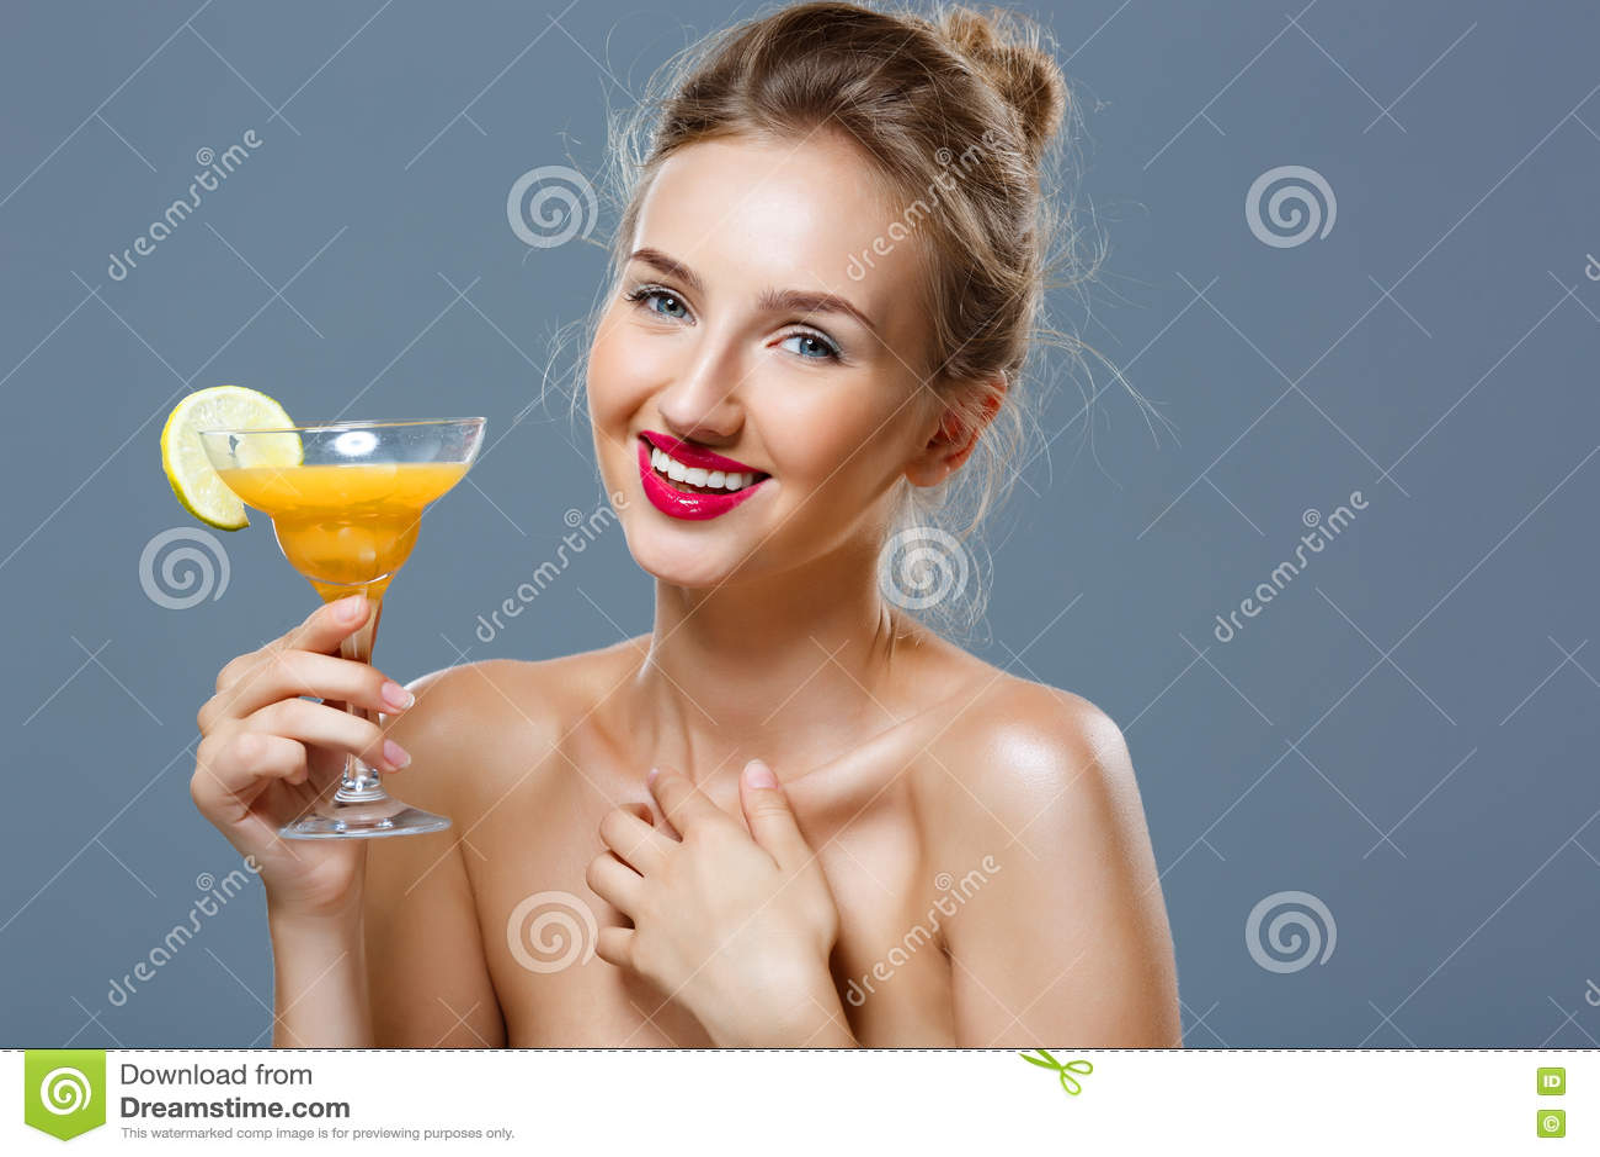 Before big tits mature porn stars open all the doors